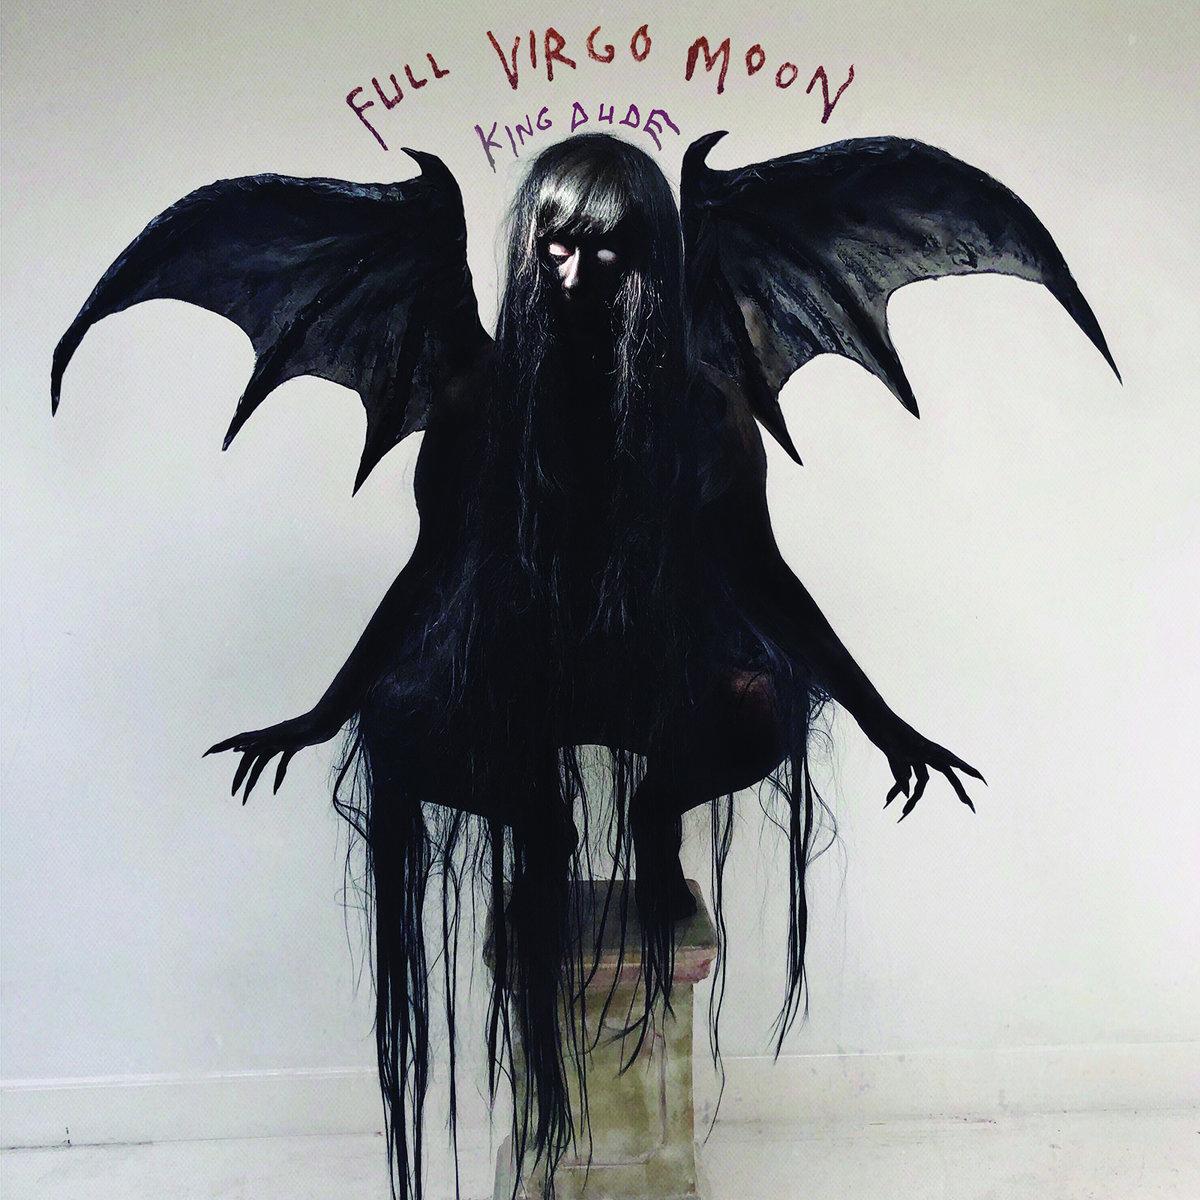 King Dude -Full Virgo Moon